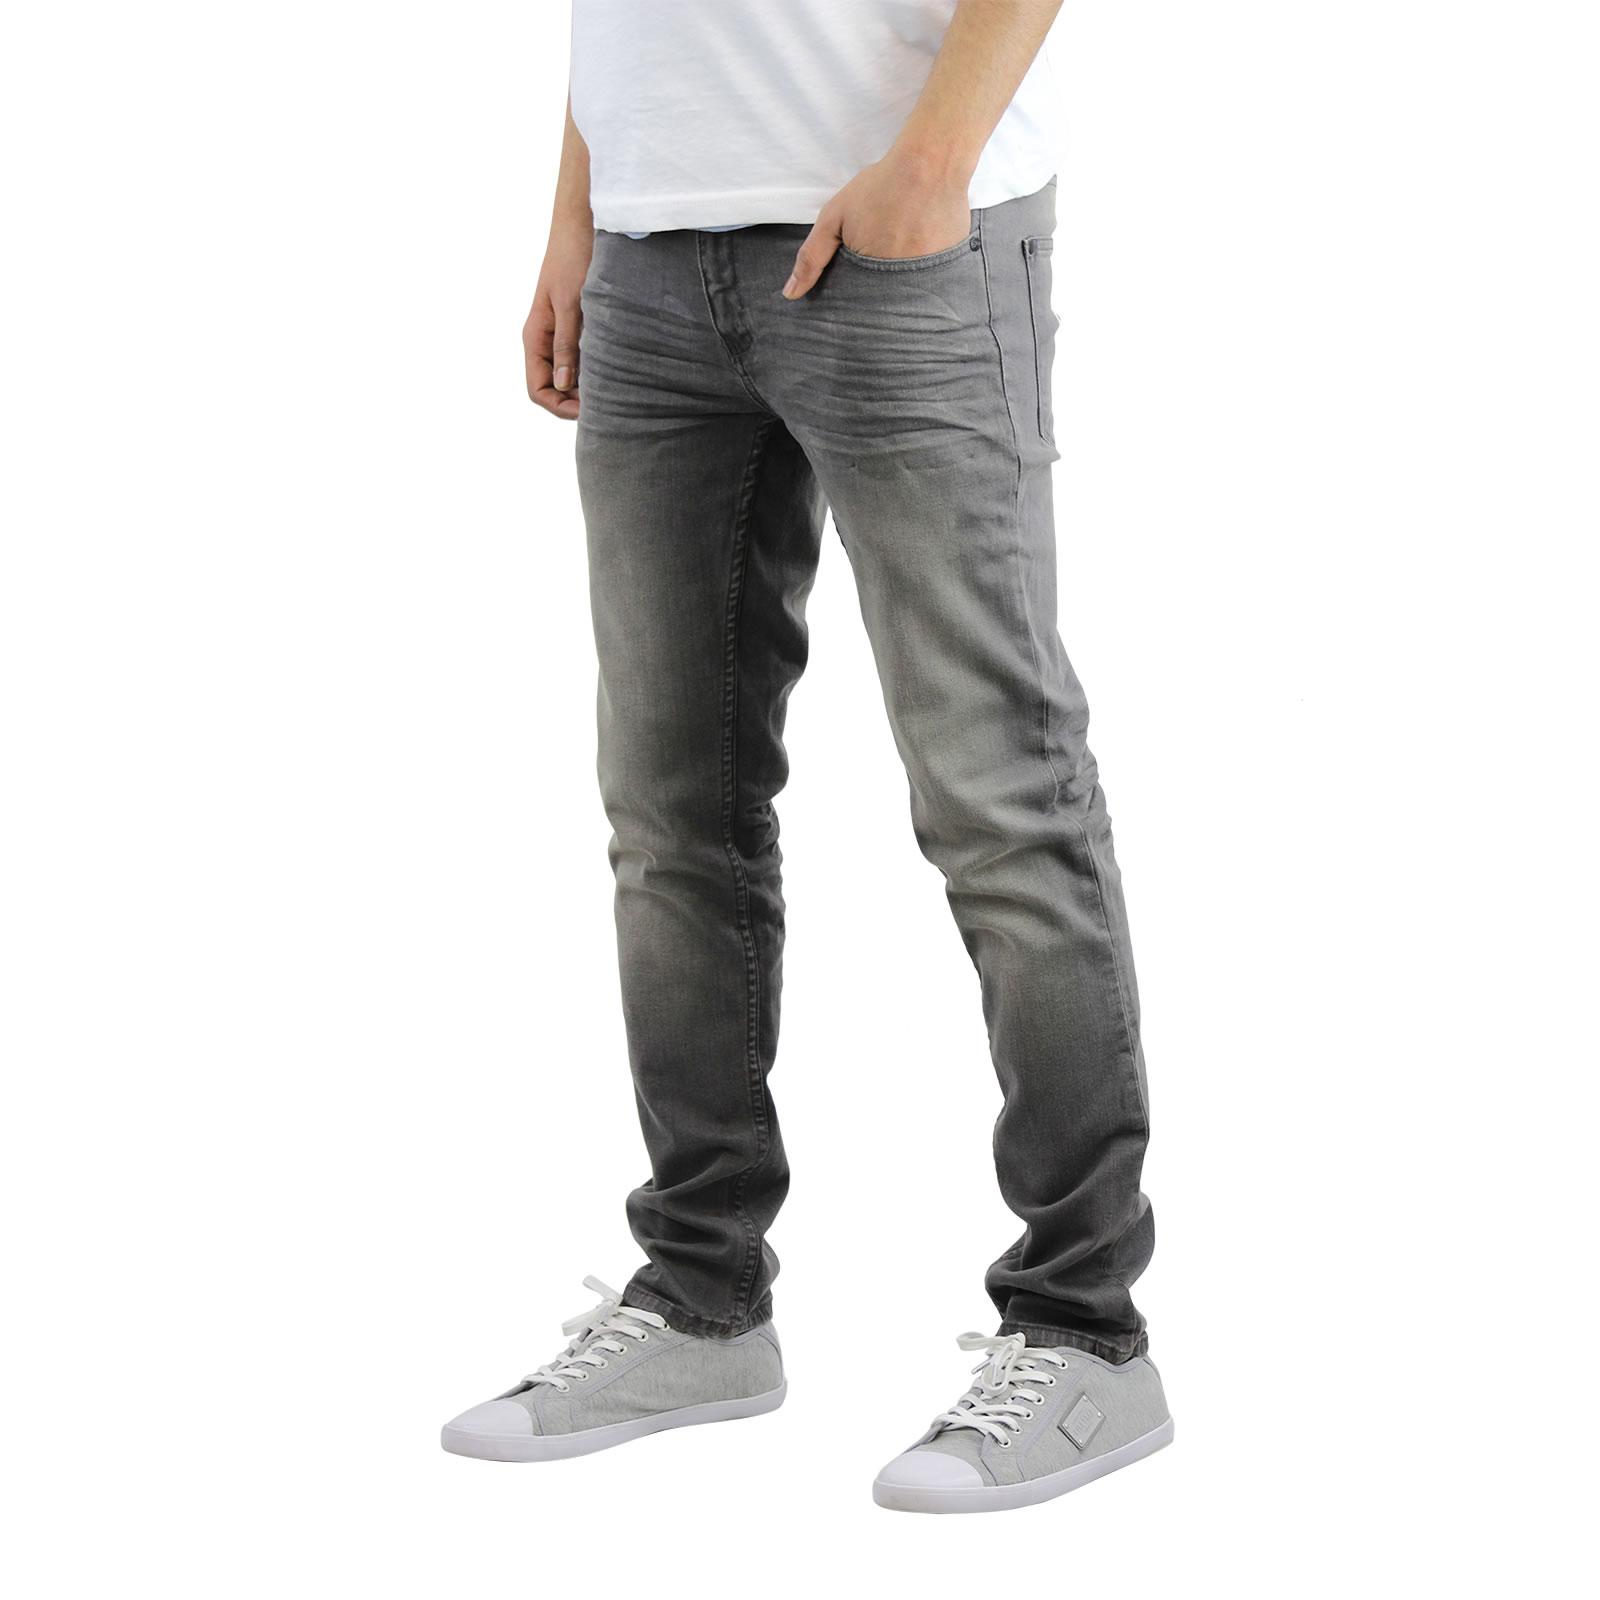 miniature 9 - Homme-Crosshatch-Jaco-Slim-Jeans-stretch-pantalon-denim-effet-vieilli